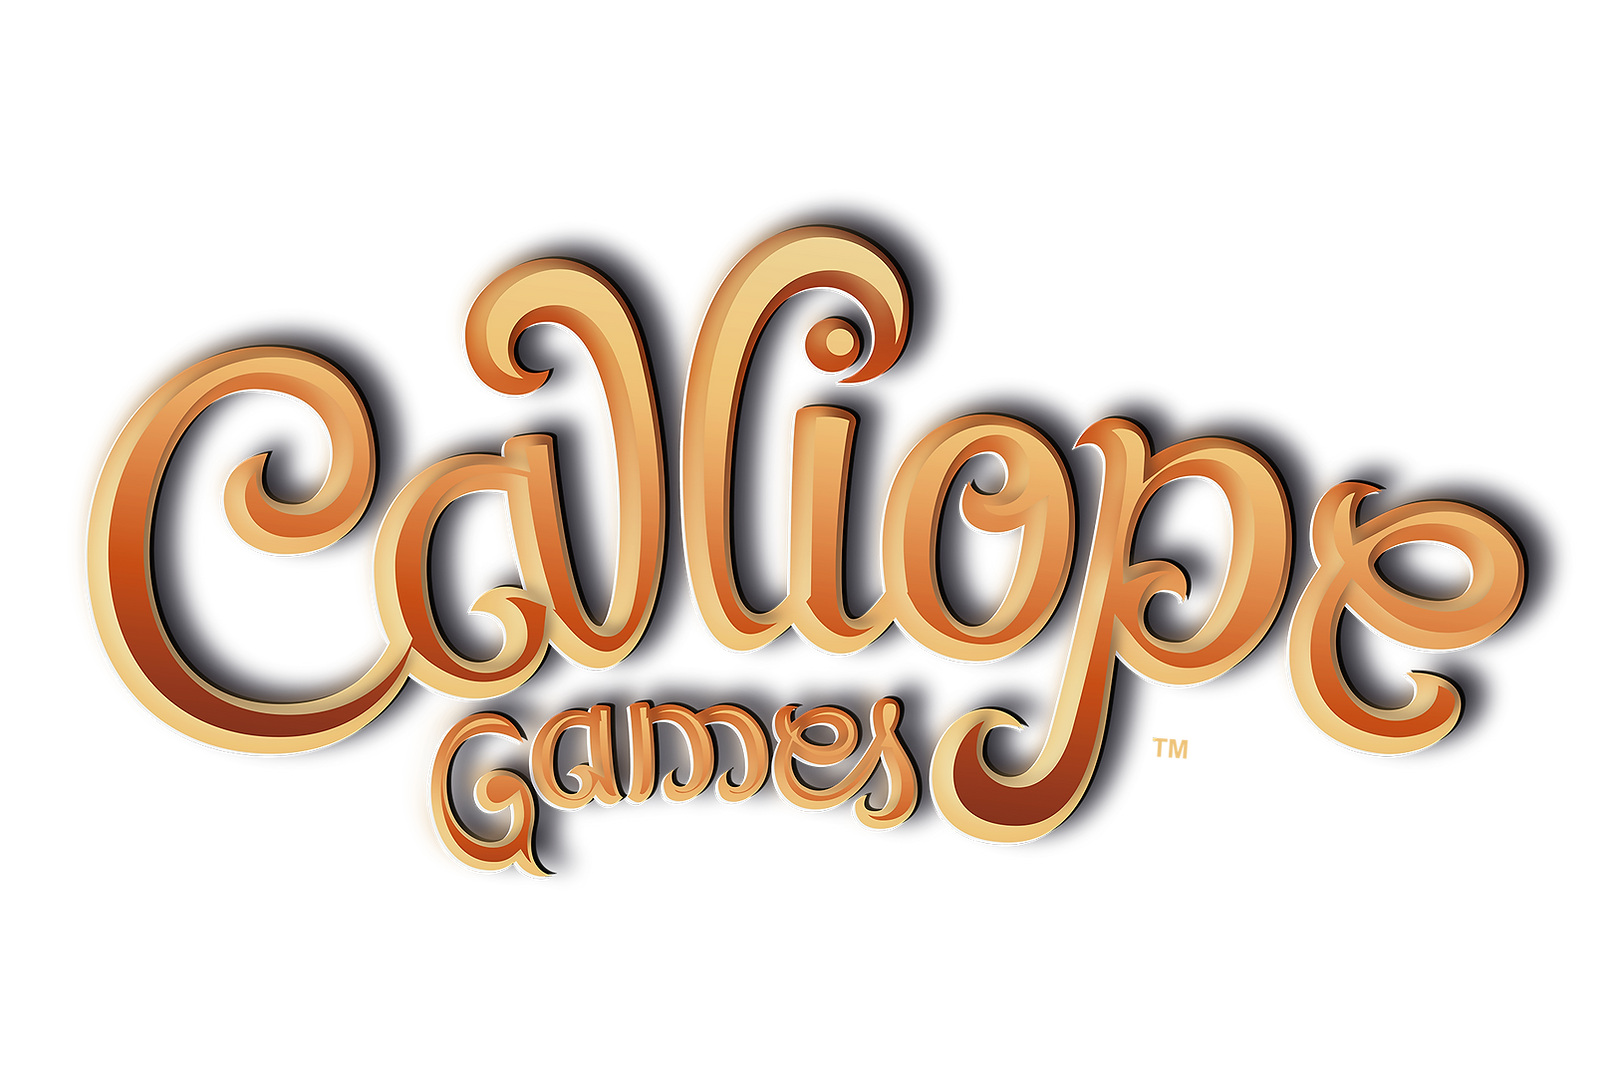 calliope_logo1920x1280.png